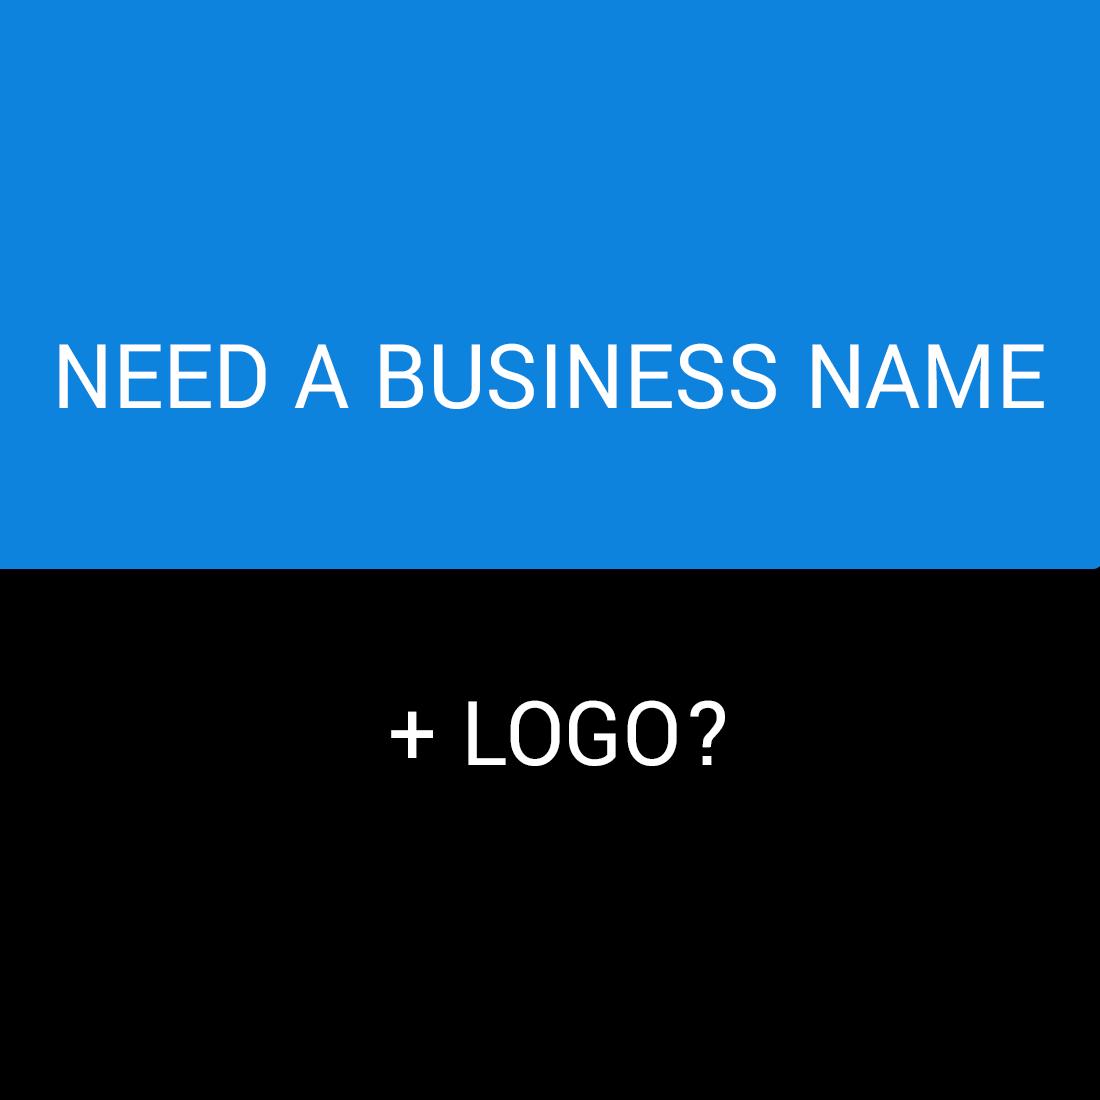 BUSINESS NAME + LOGO